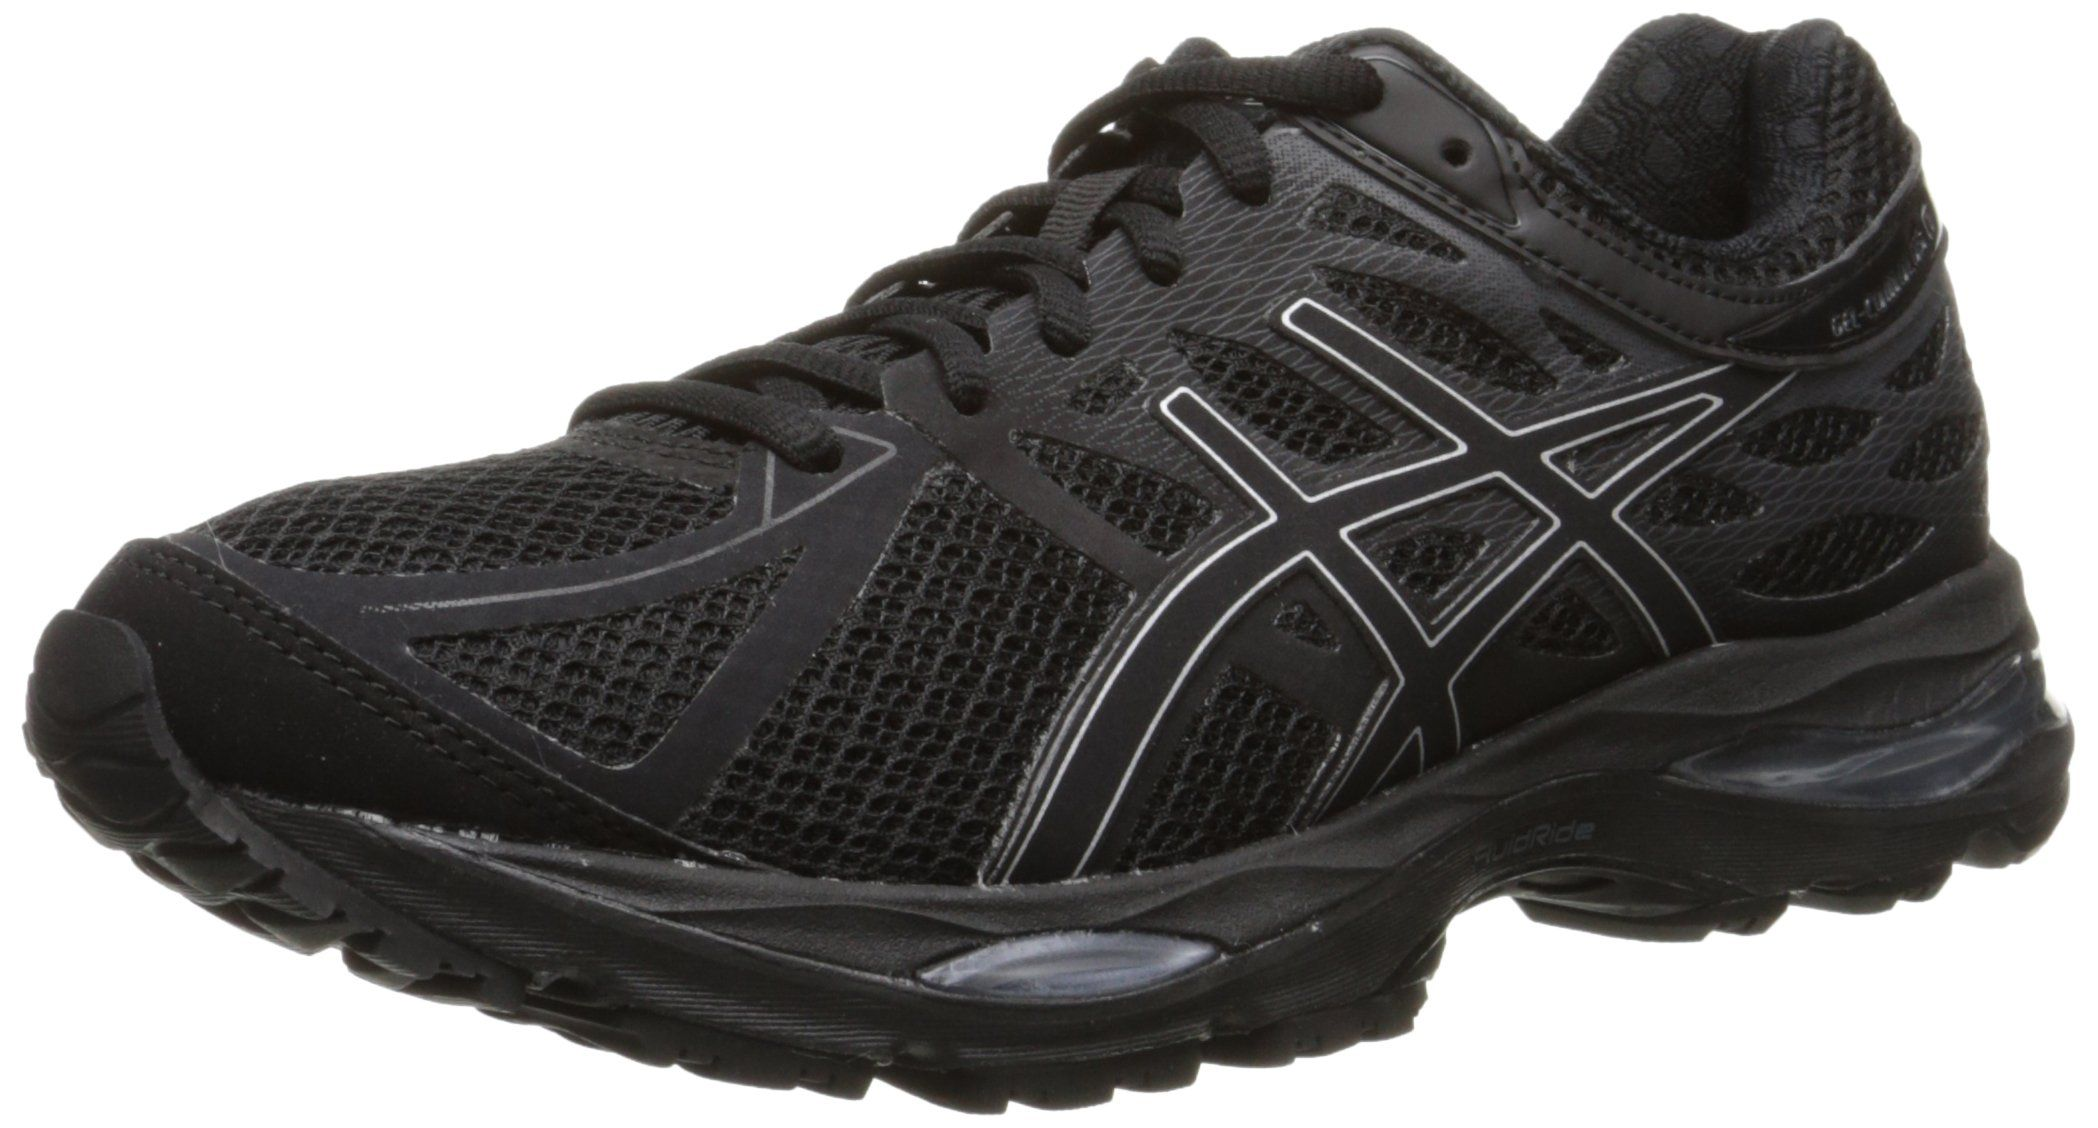 ASICS Womens Gelcumulus 17 Running Shoe Black/Silver/Onyx 6 ...